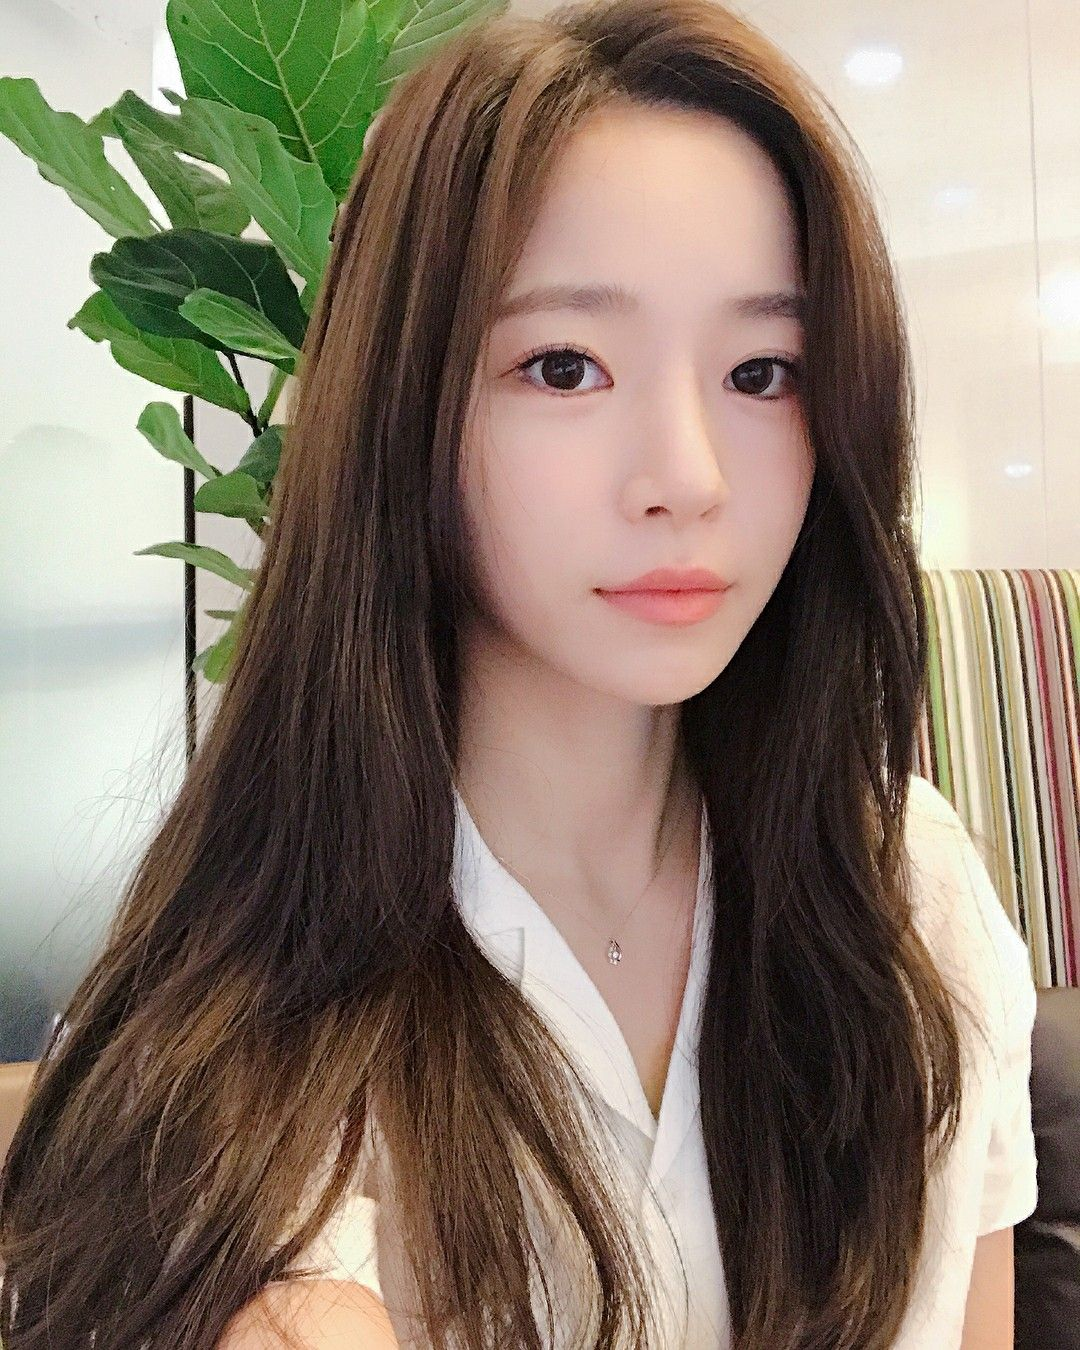 Hyorin | Women, Kpop fashion, Kpop girls